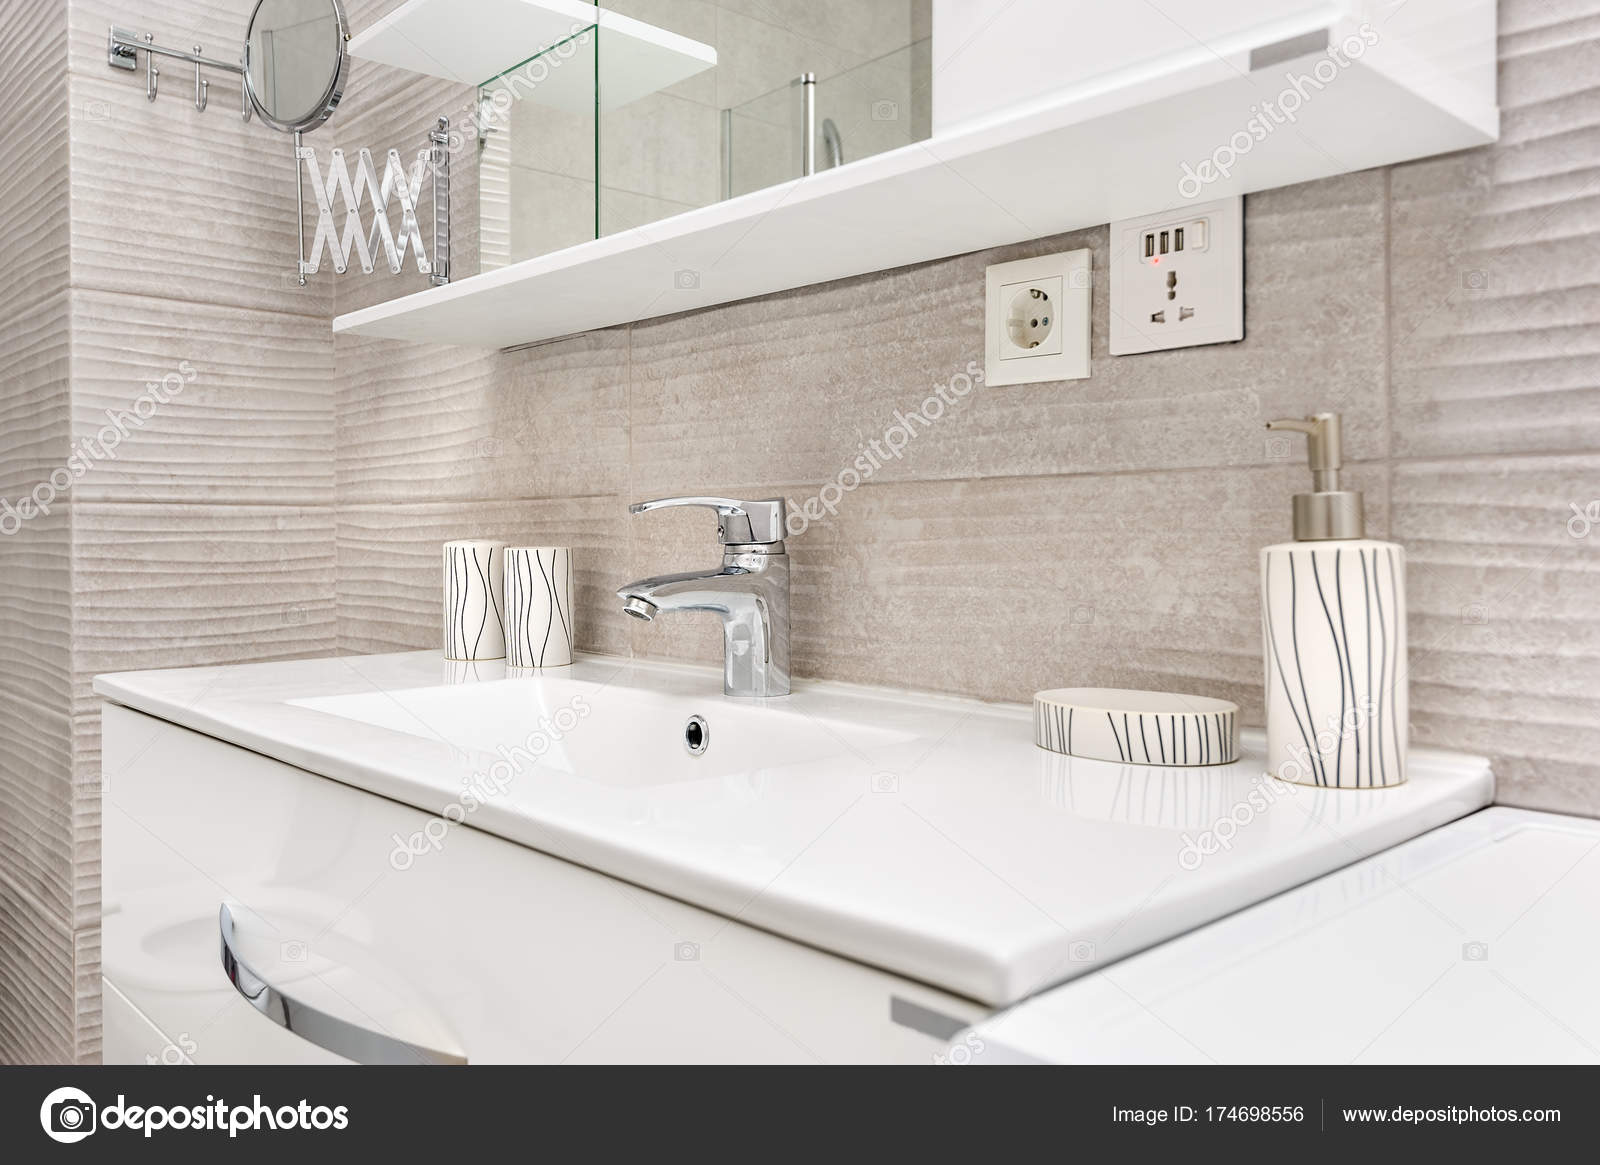 Badkamer Gootsteen Kast : Zinken in moderne badkamer u stockfoto starush